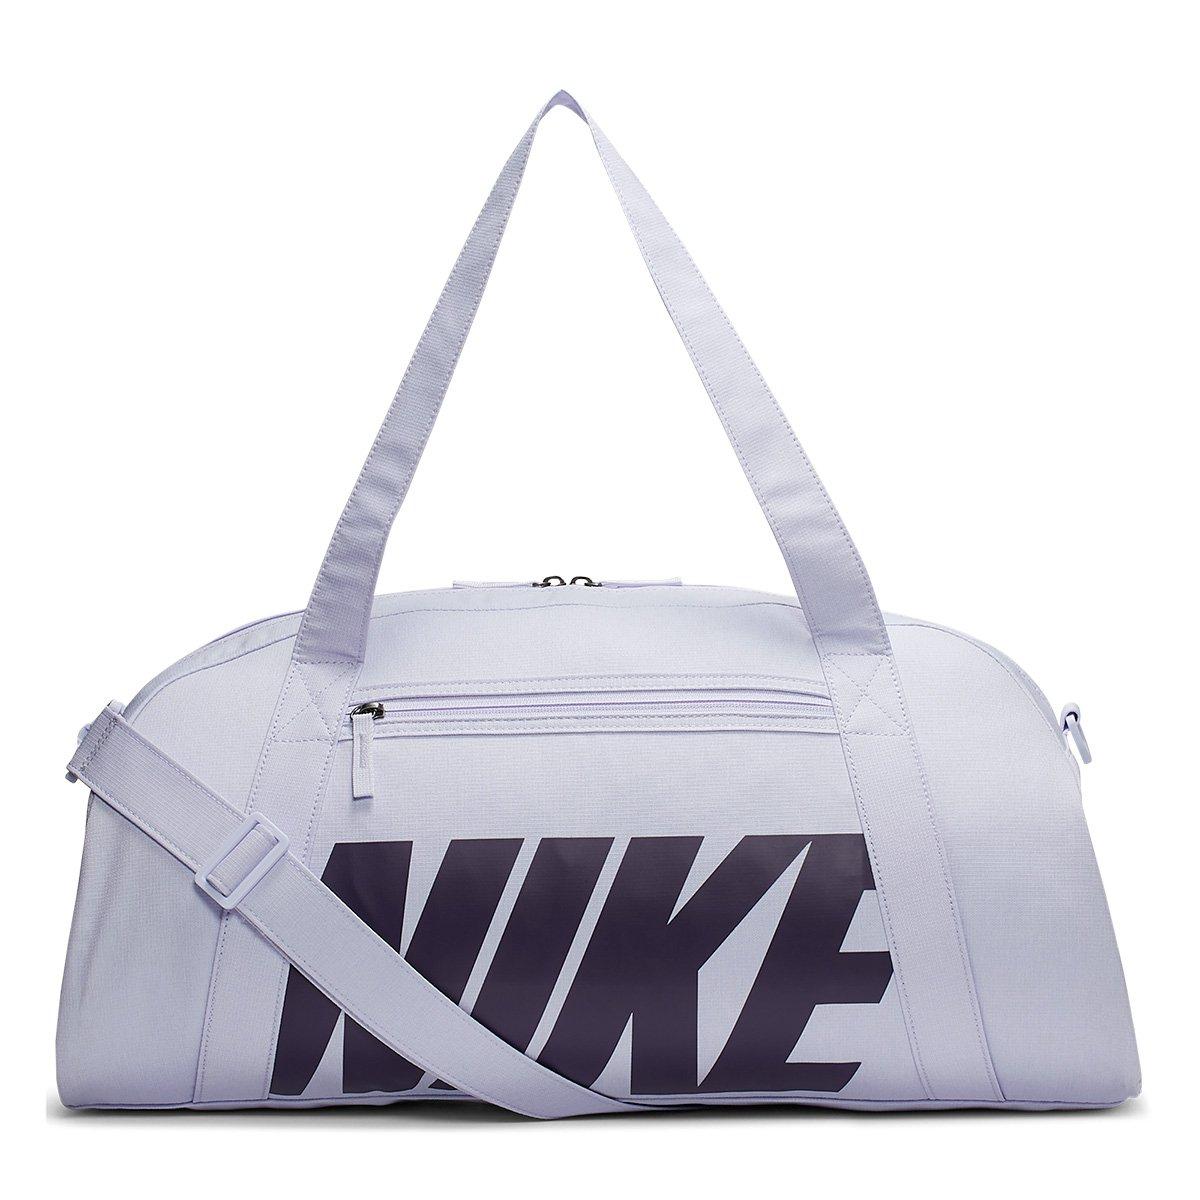 Nike Gym Litros E Club Rosa 30 Bolsa Feminina Chumbo Ac4jLR3q5S